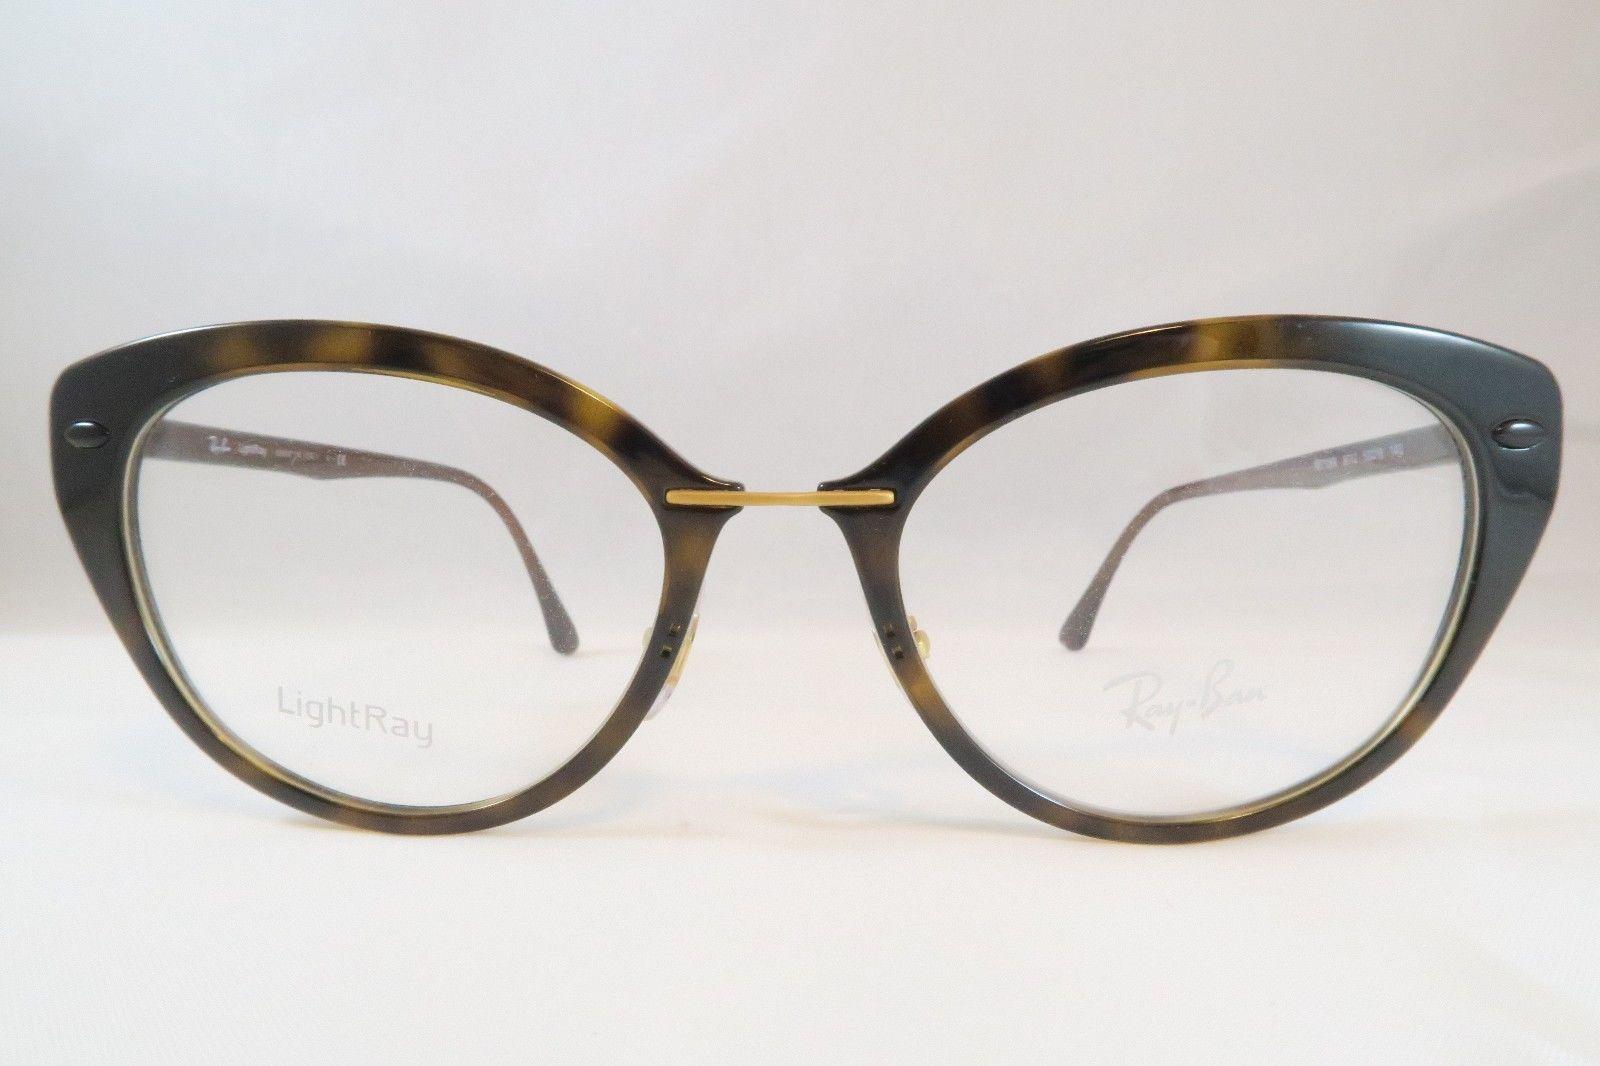 45639e649d Ray Ban RB 7088 2012 Eyeglasses Frames LightRay 52mm - 3